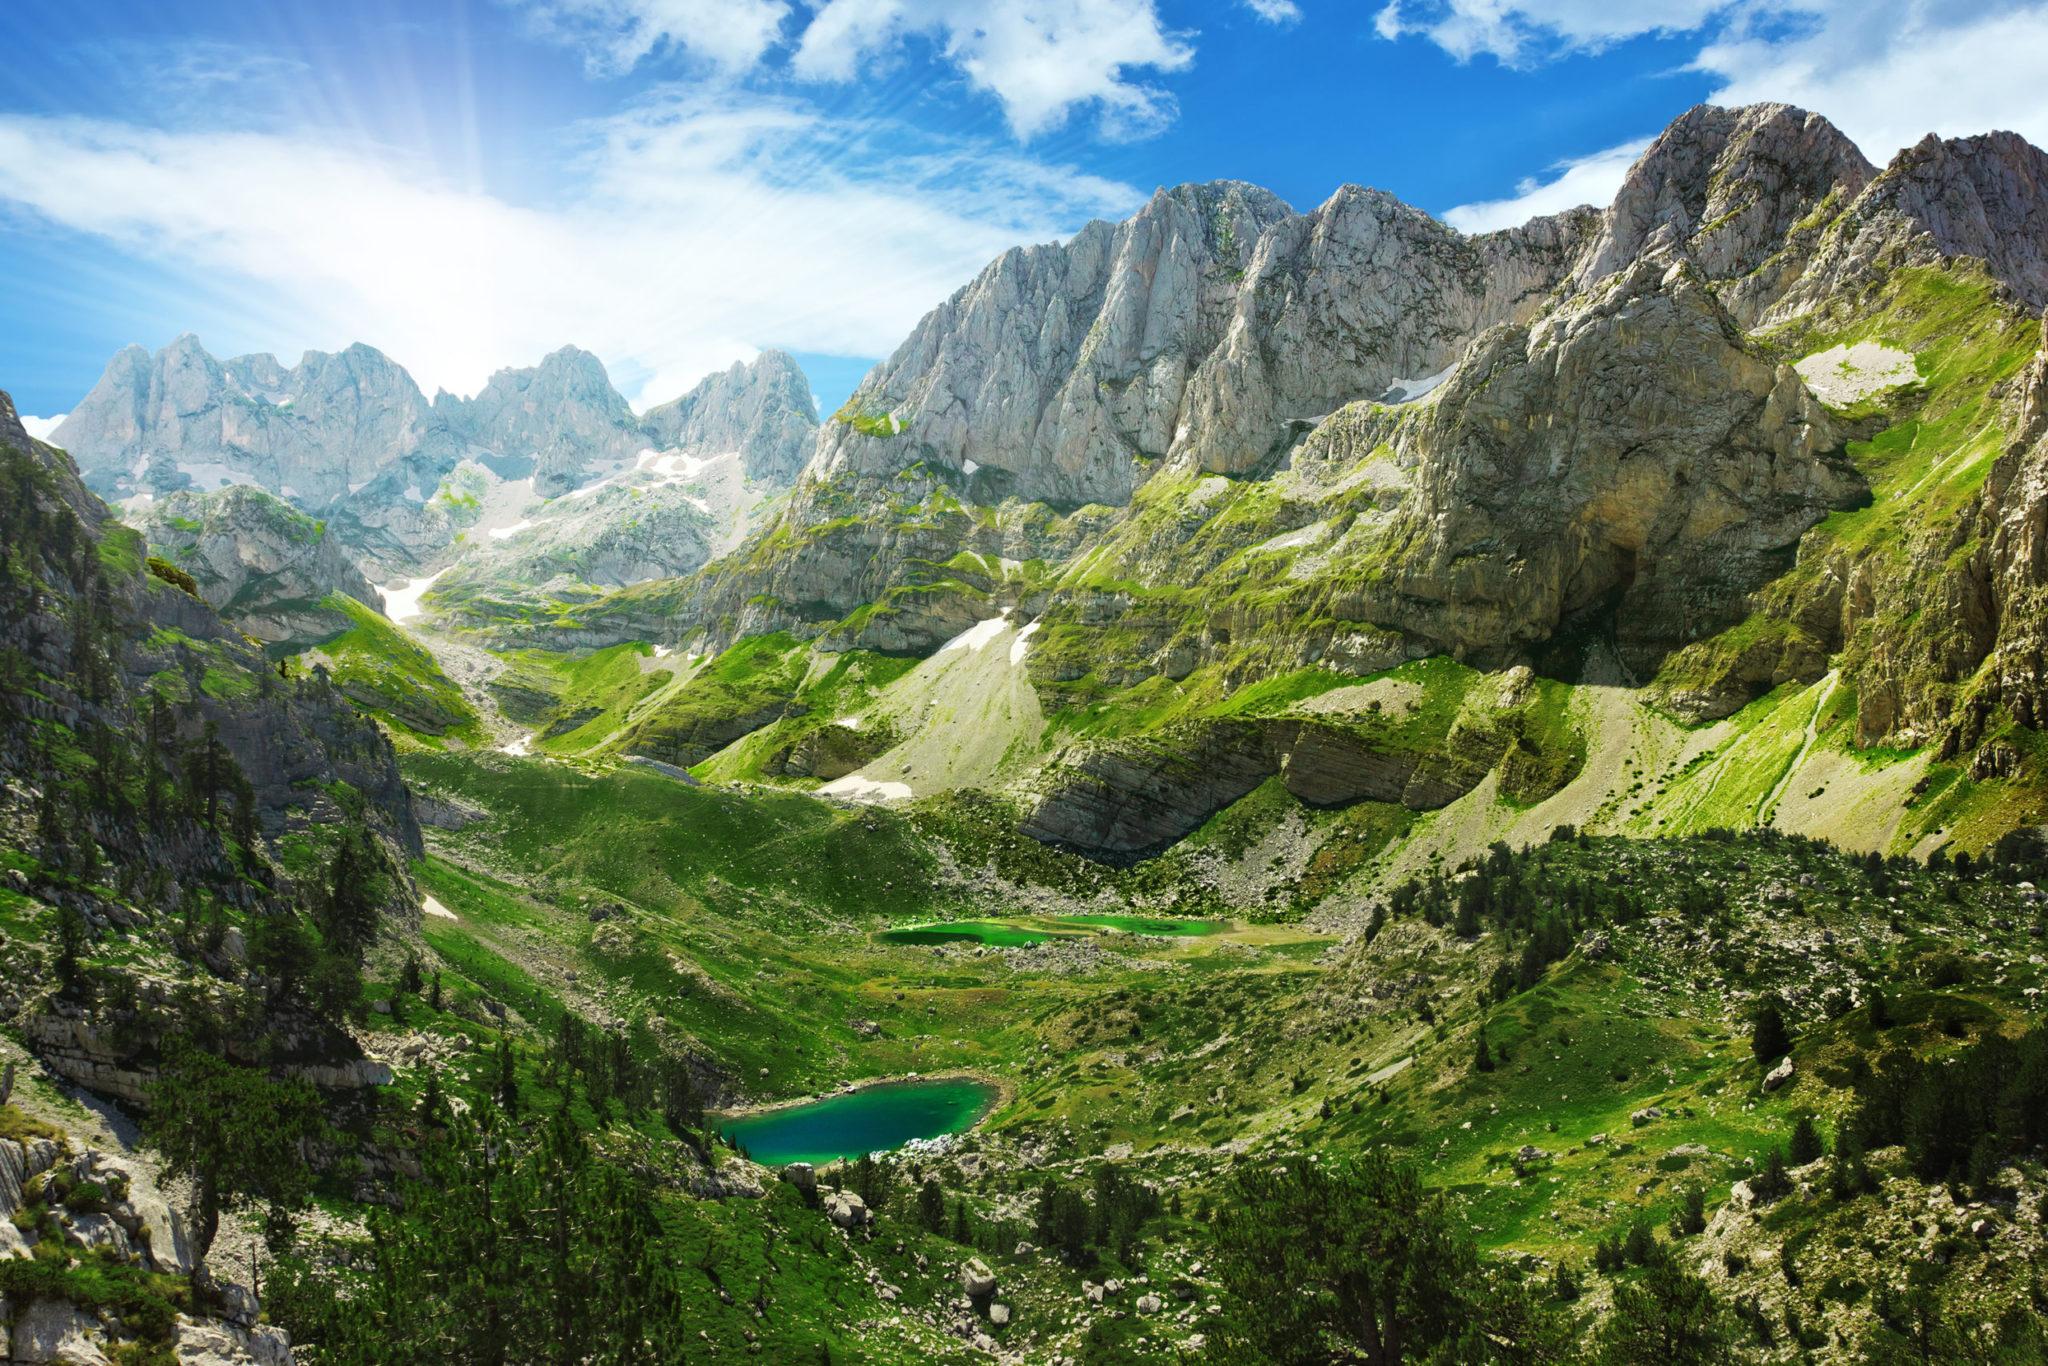 Albania hiking holiday: Trails of Albanian Alps